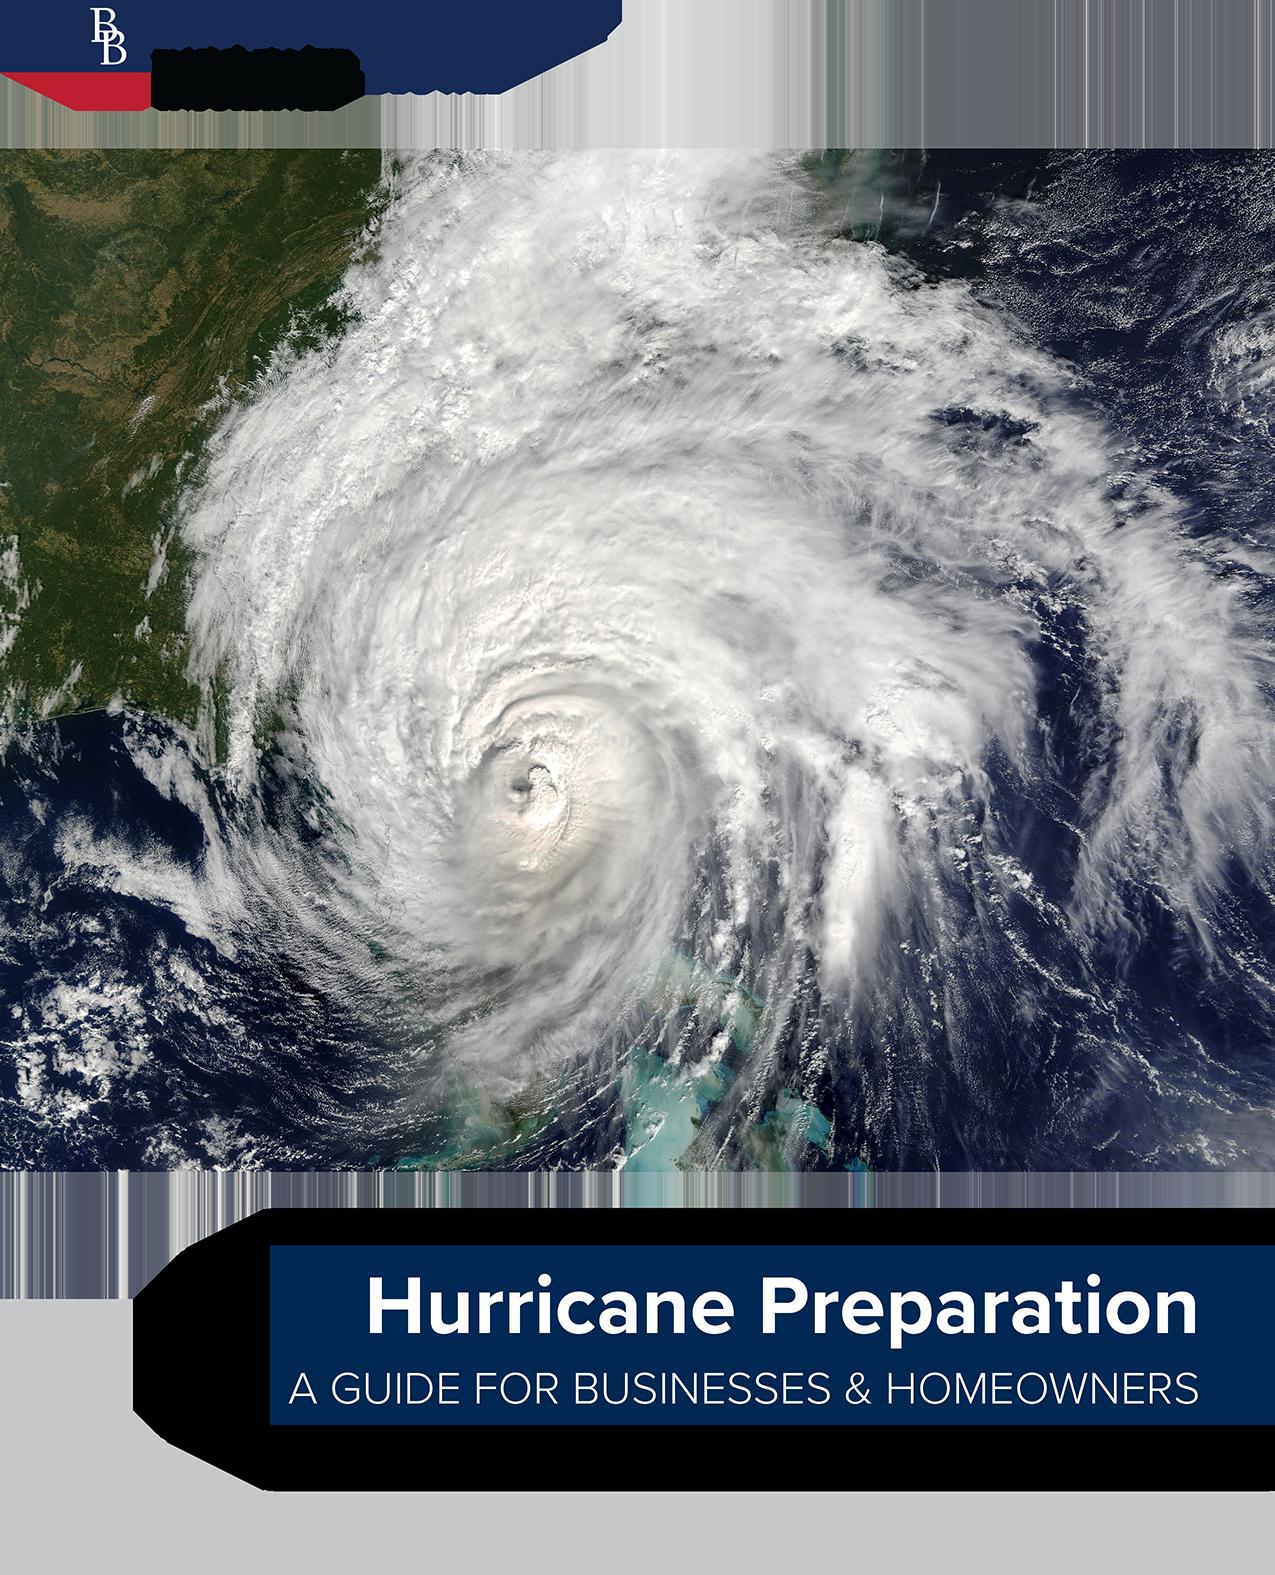 Hurricane Preparation Guide 2019 (1)-1